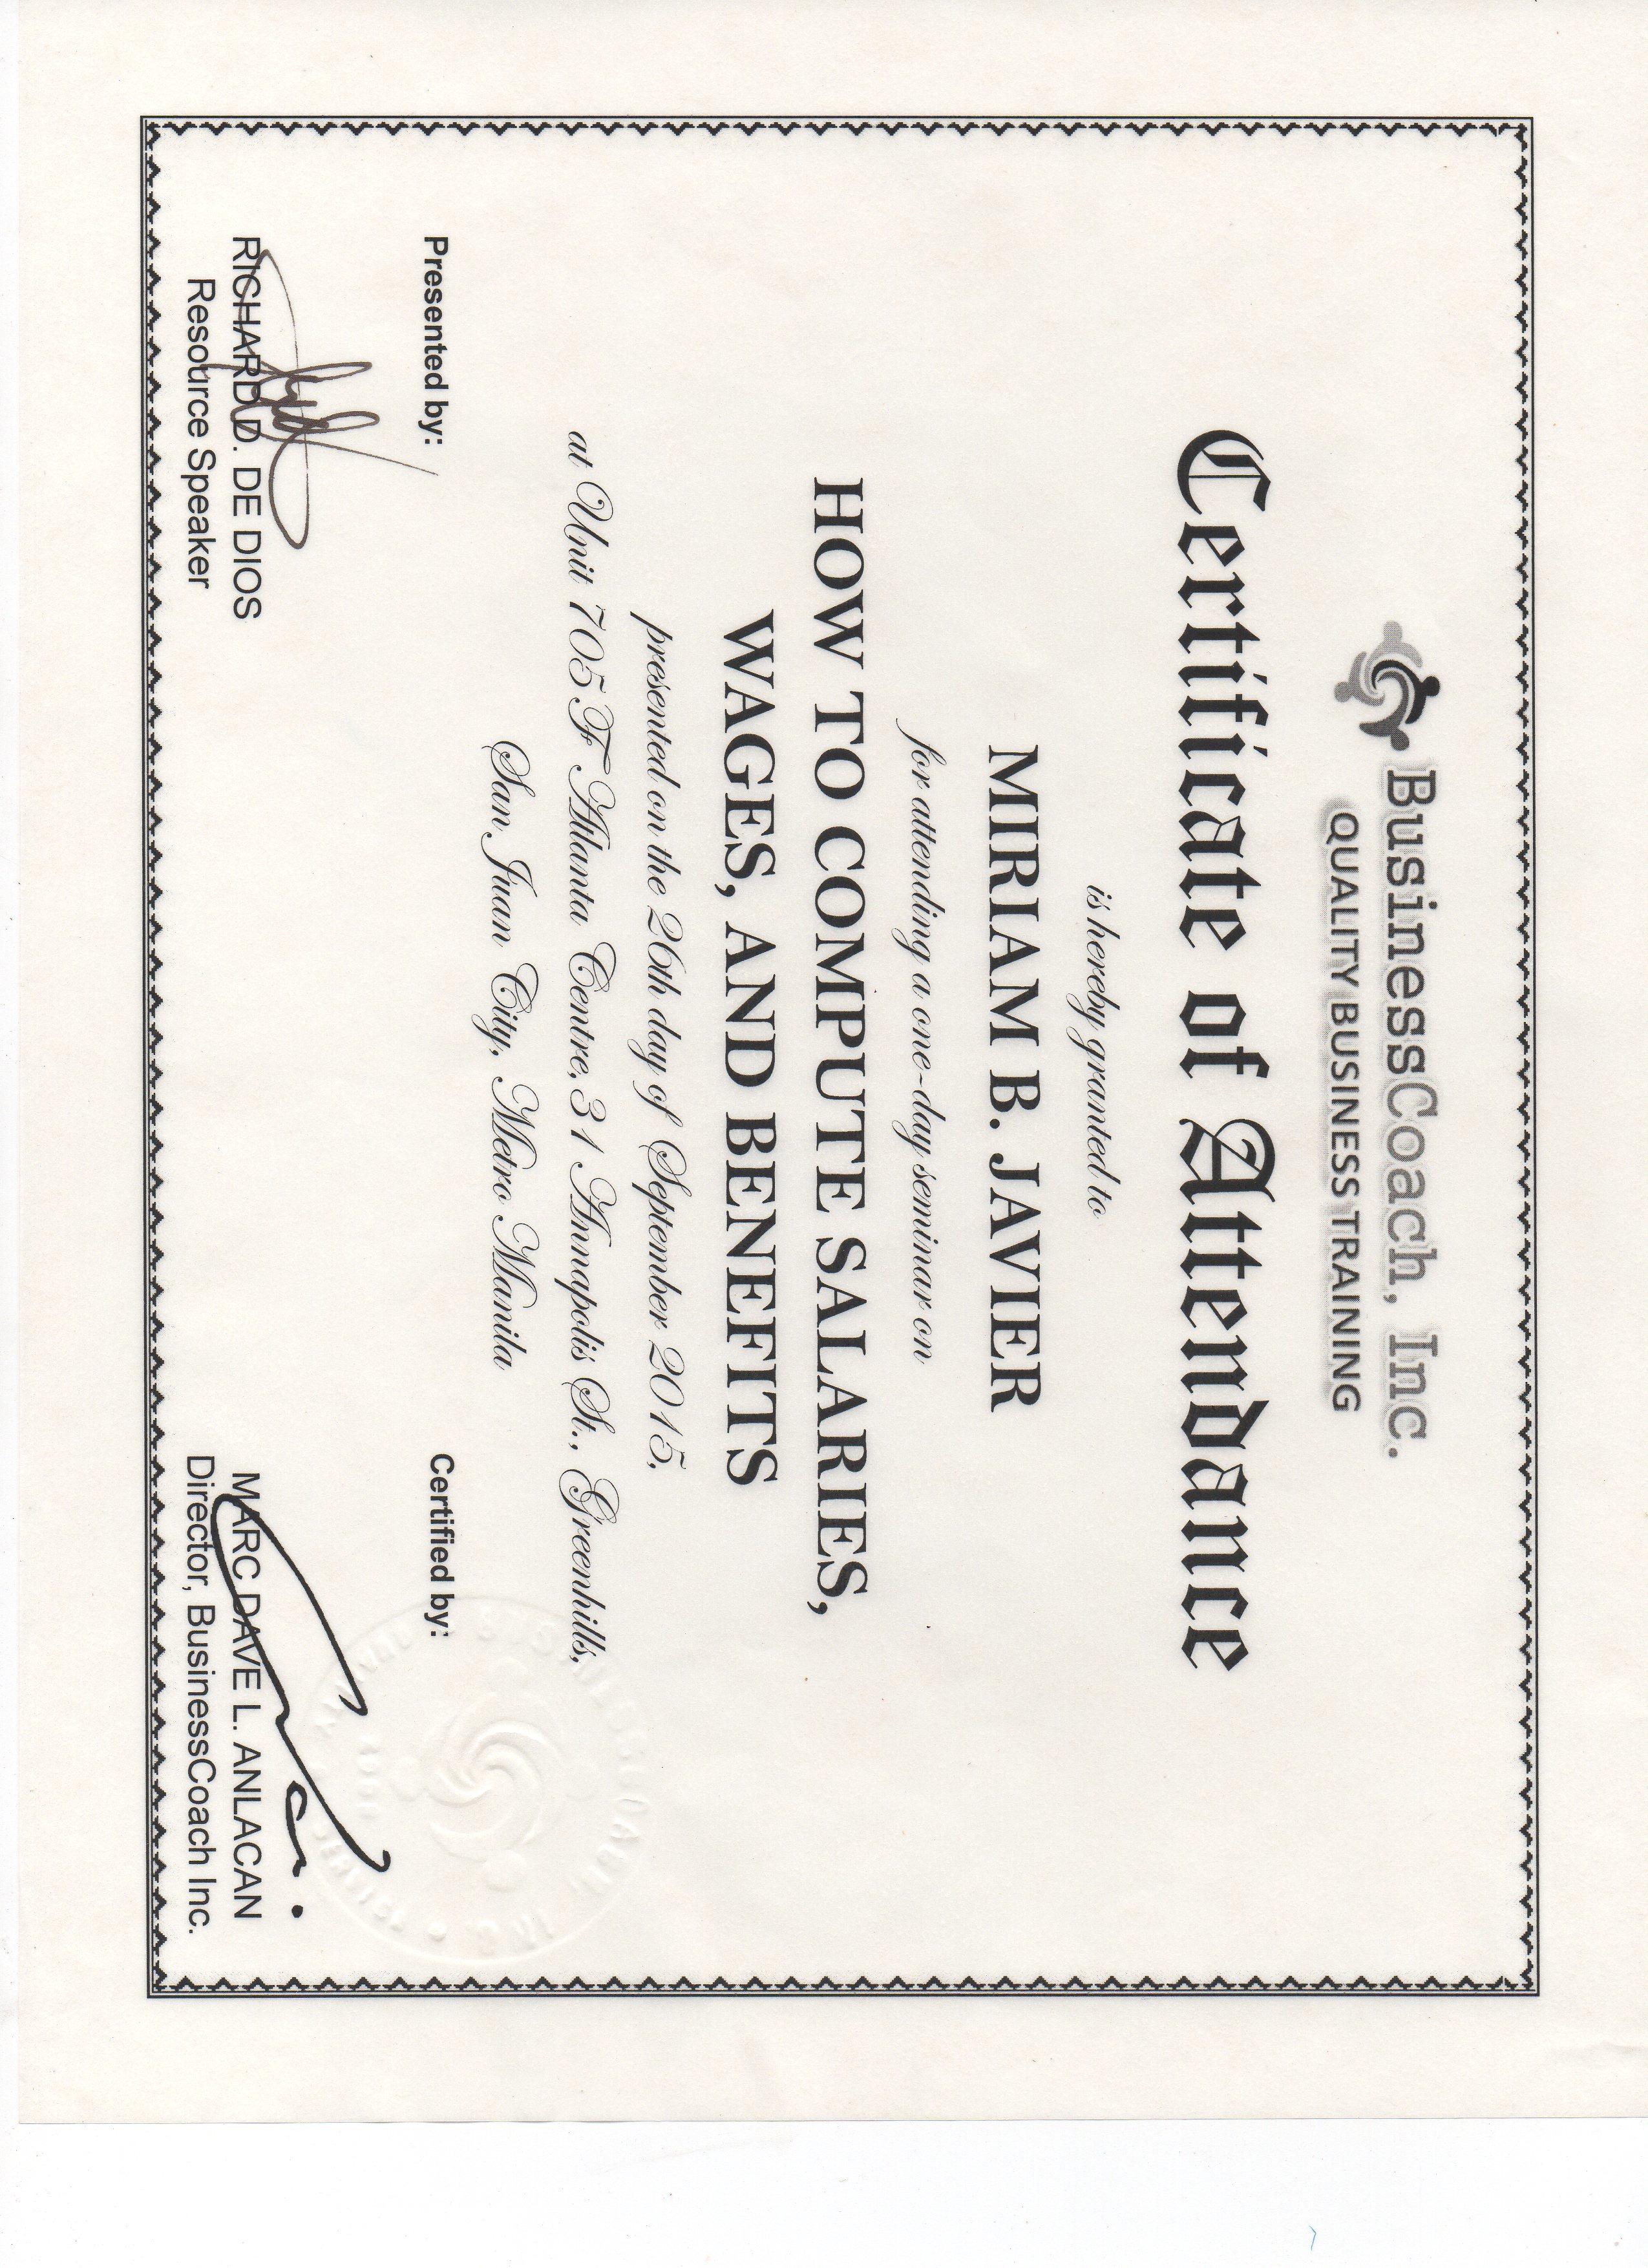 Certified Business Coach Training Tollebild